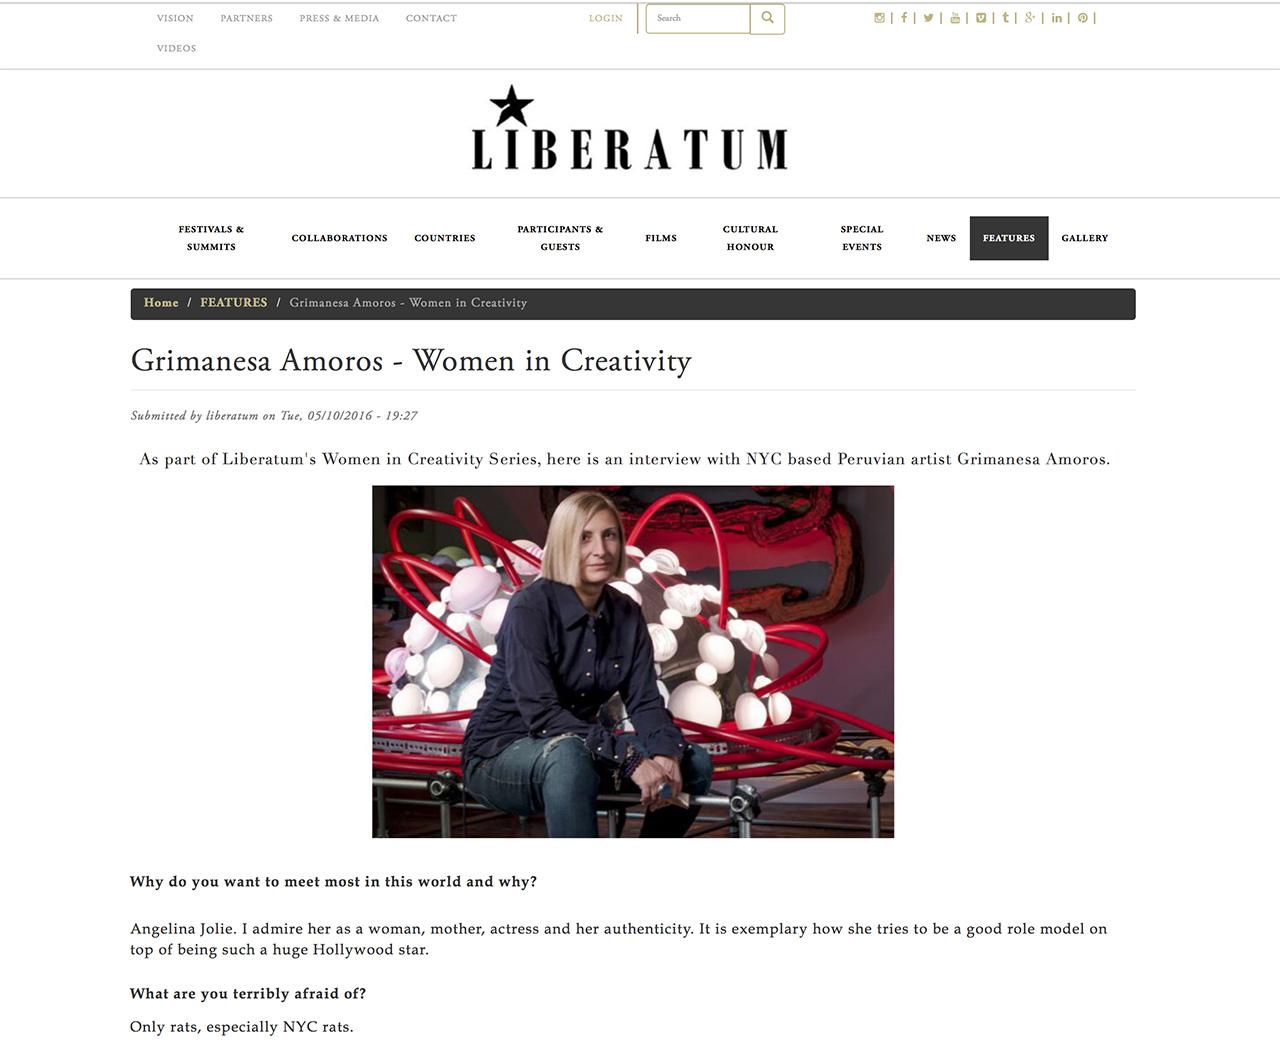 grimanesa amoros Liberatum interview